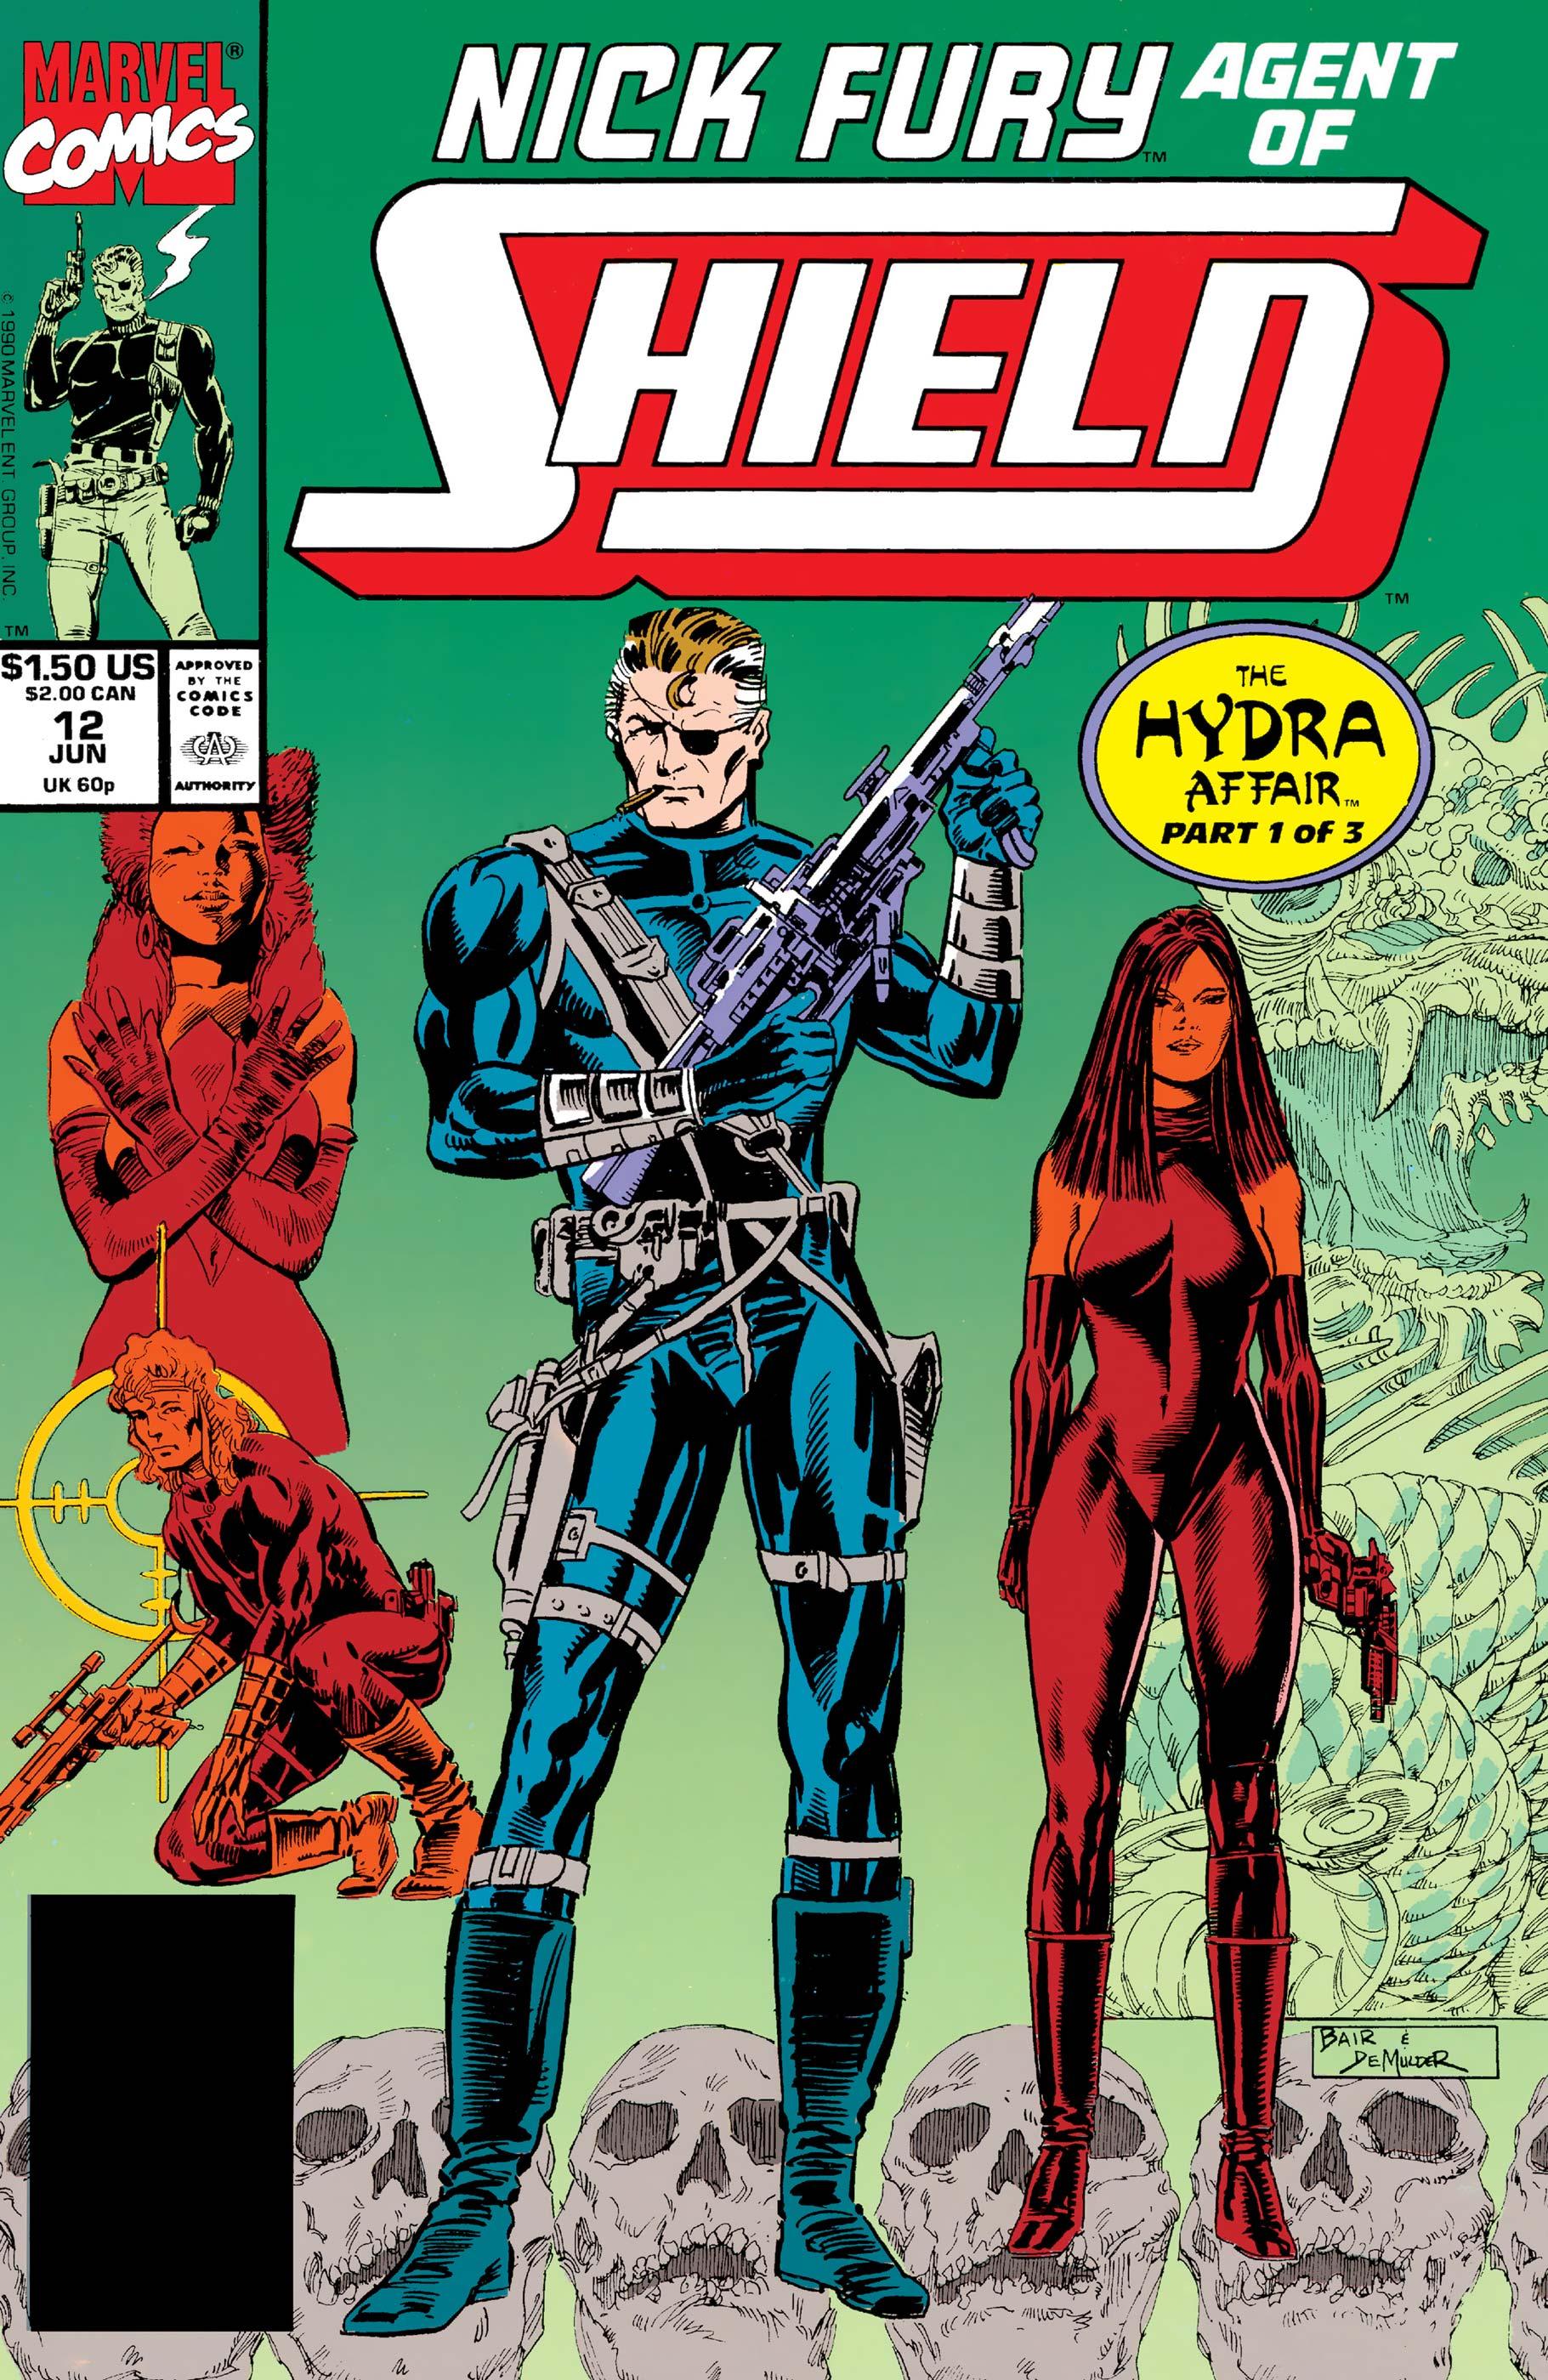 Nick Fury, Agent of S.H.I.E.L.D. (1989) #12